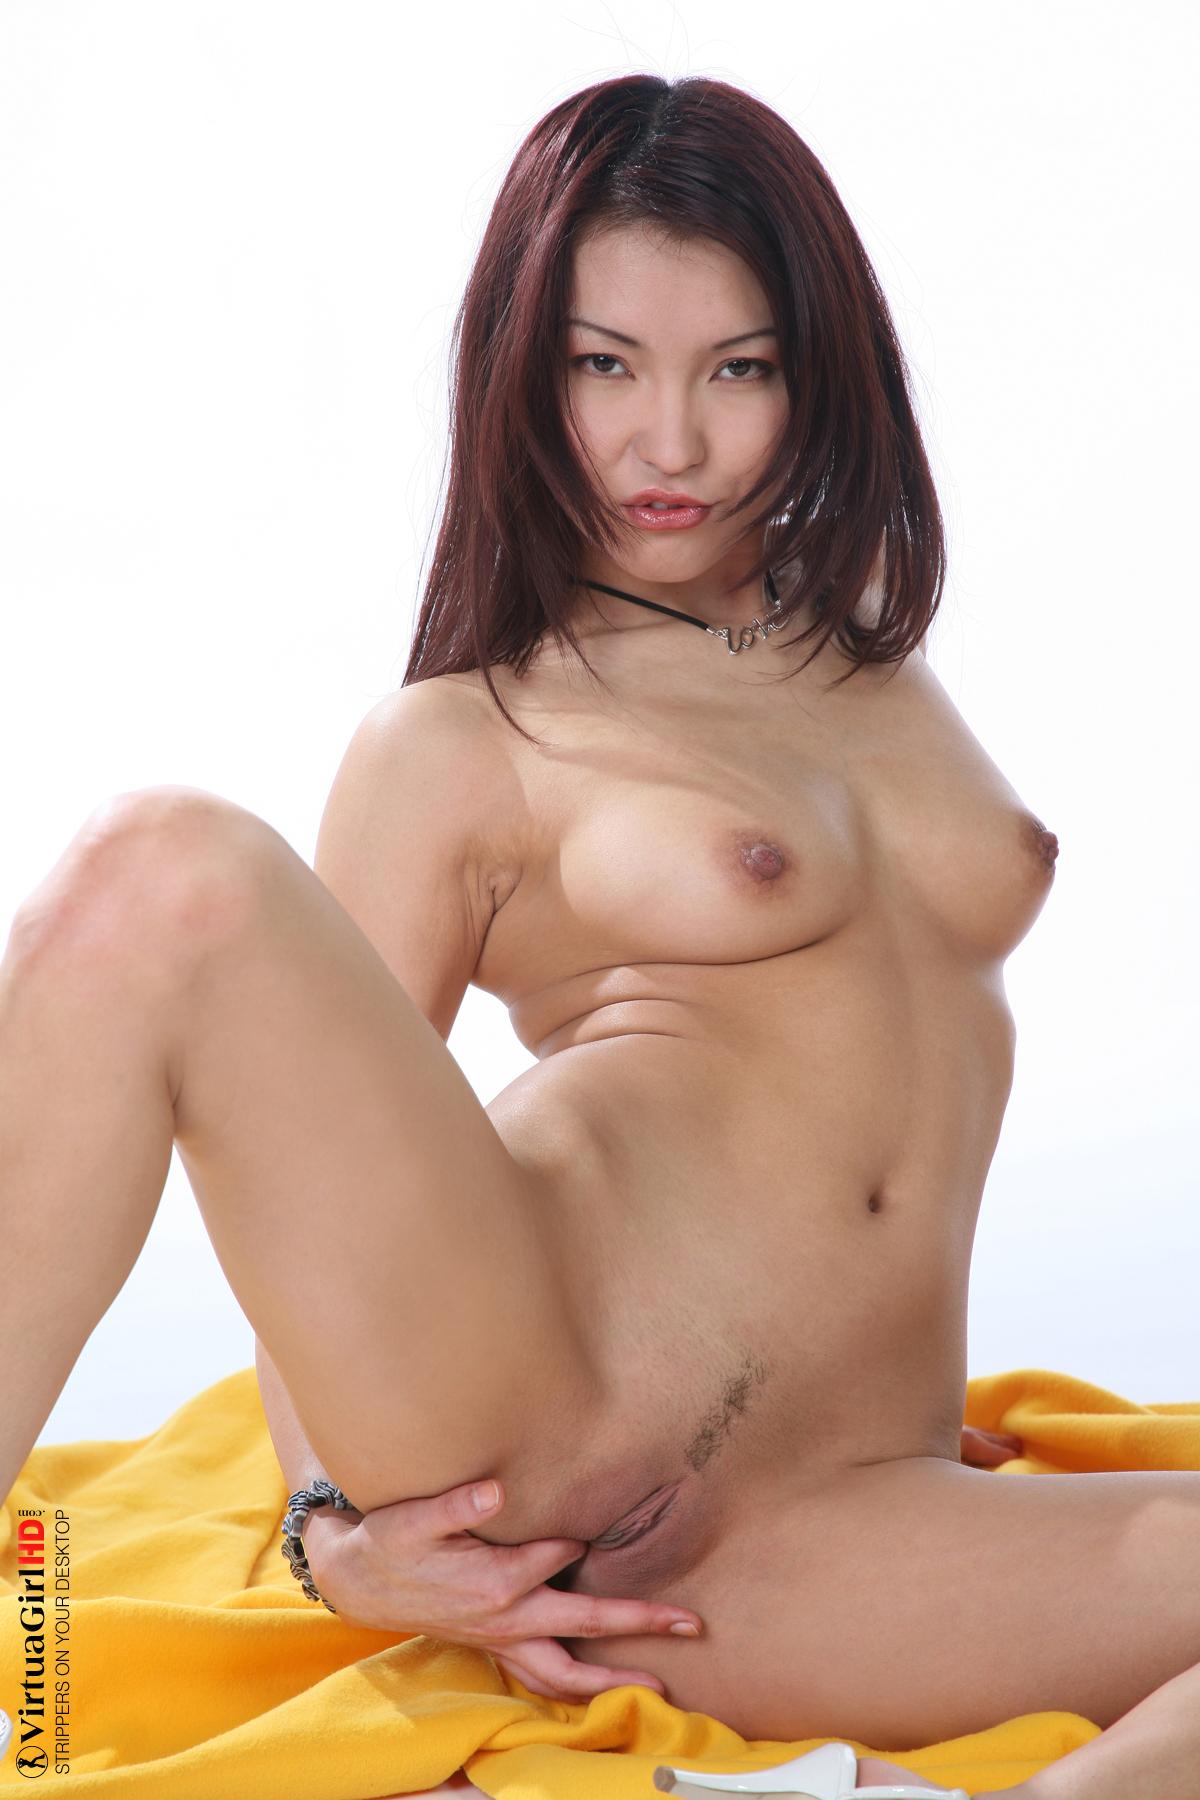 girls stripping for camera